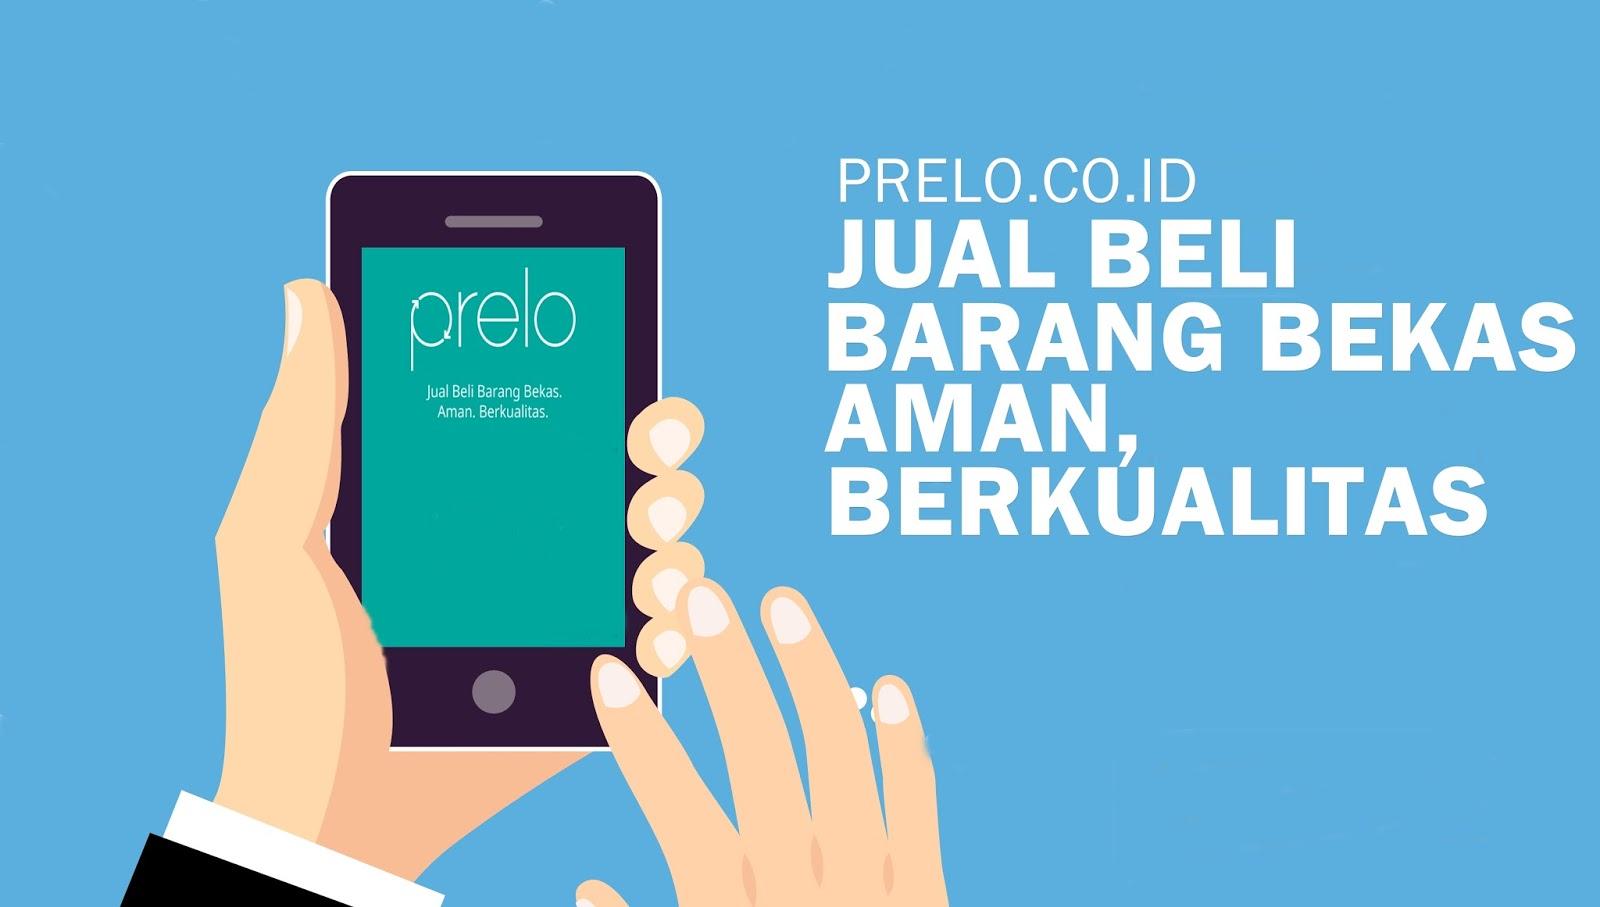 Prelo.co.id : E - Commers Barang Bekas Dengan Harga Murah